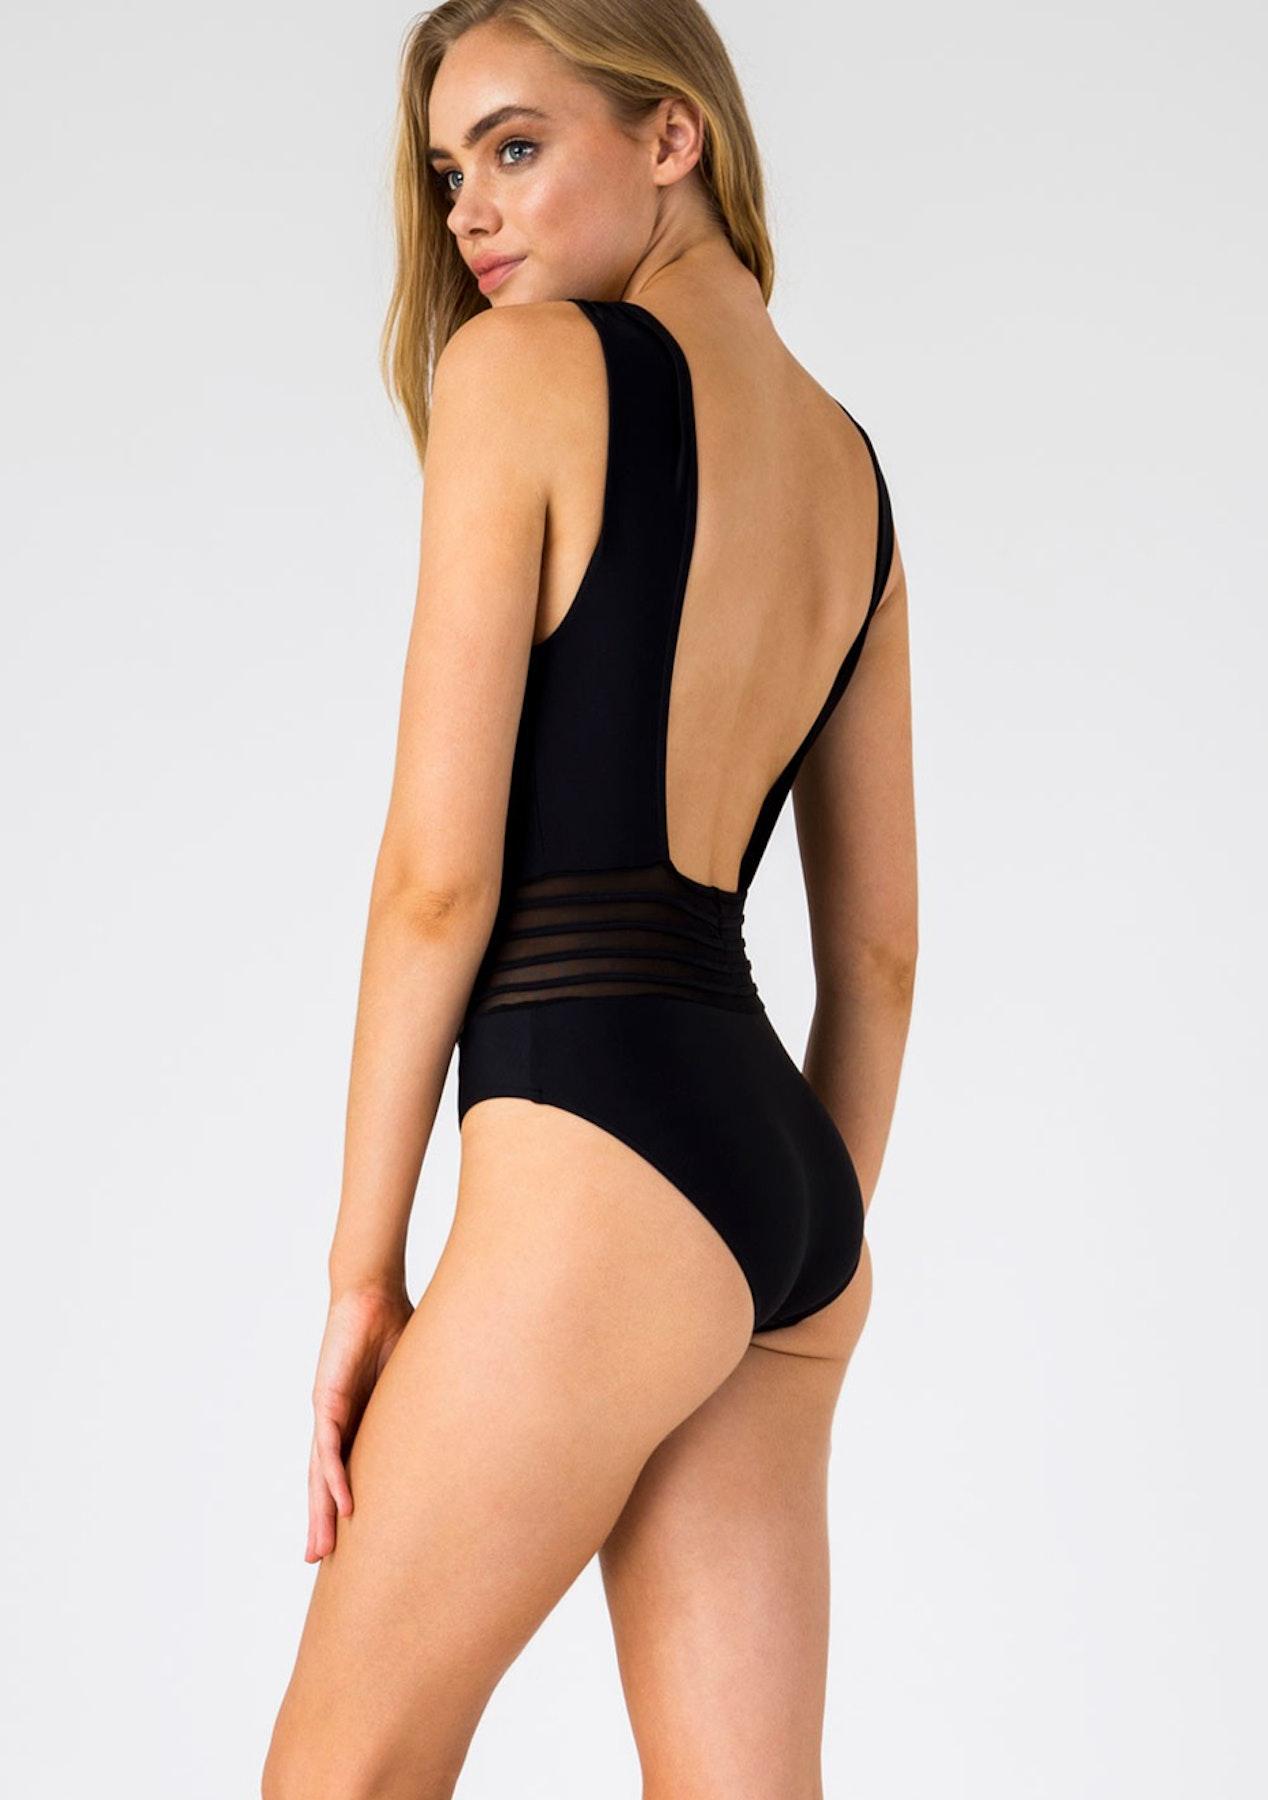 e0fd53e744f98 Sheridyn Swim - Lux Resort Plunge V Neck One Piece Swimsuit Black - Womens  Garage Sale - Onceit